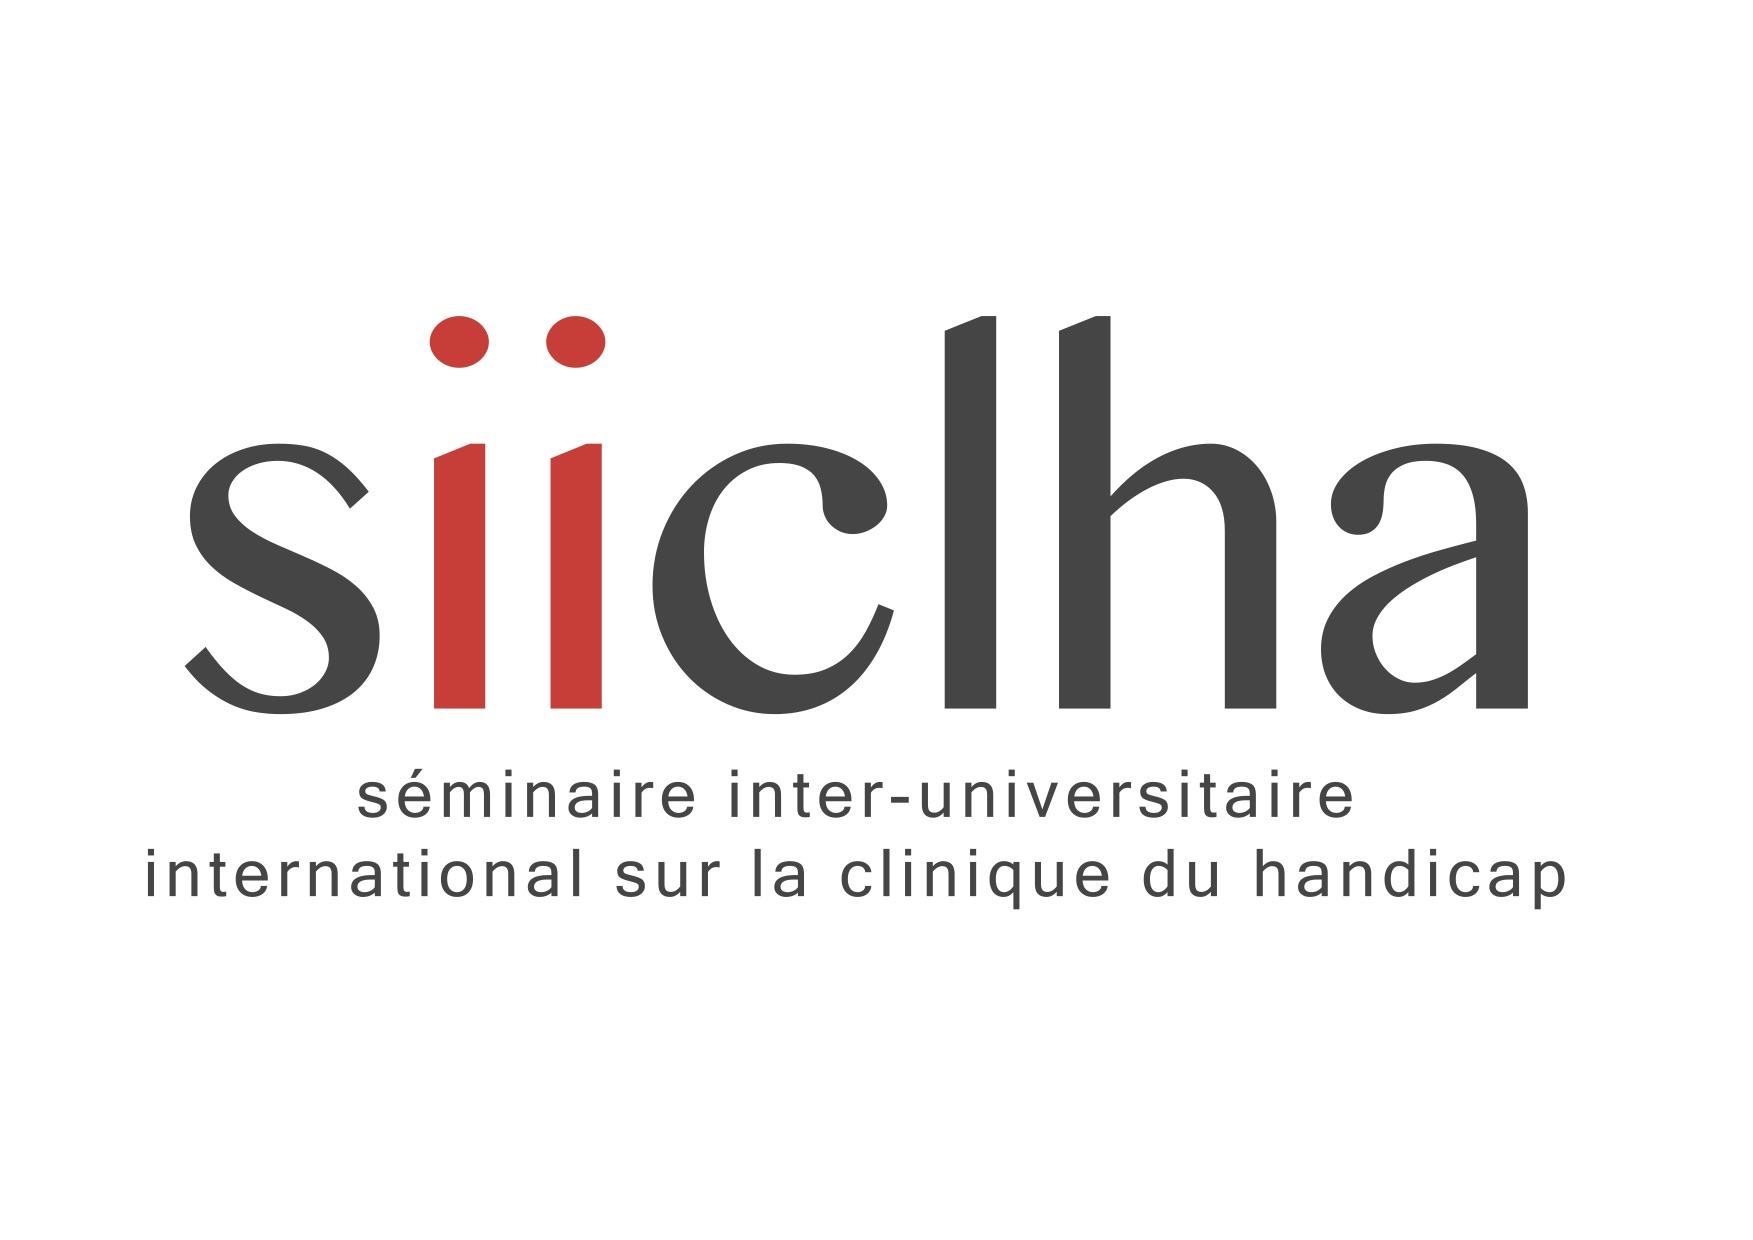 logo_siiclha_officiel - copie 2.jpg